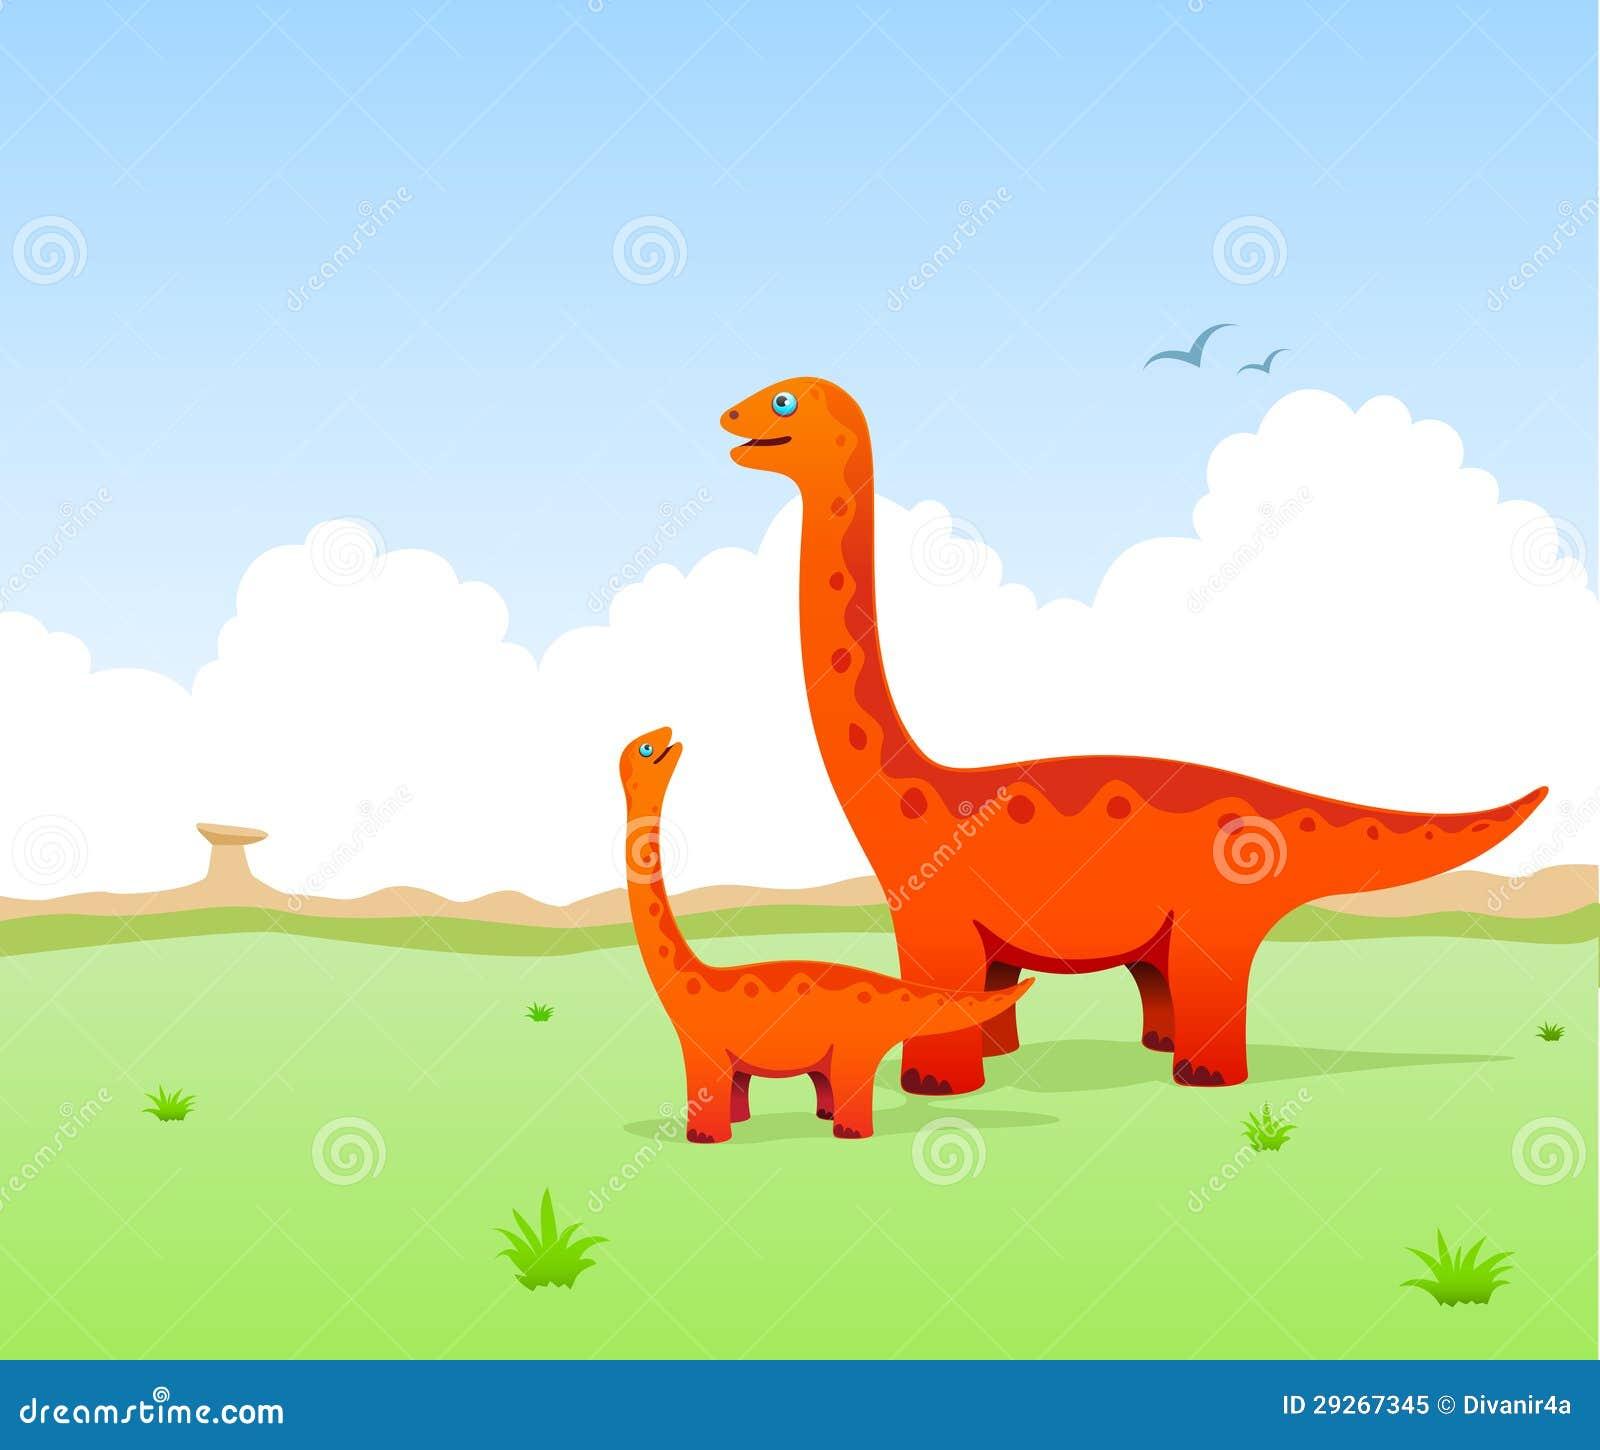 Cute Dinosaurs Illustration Stock Illustration ...